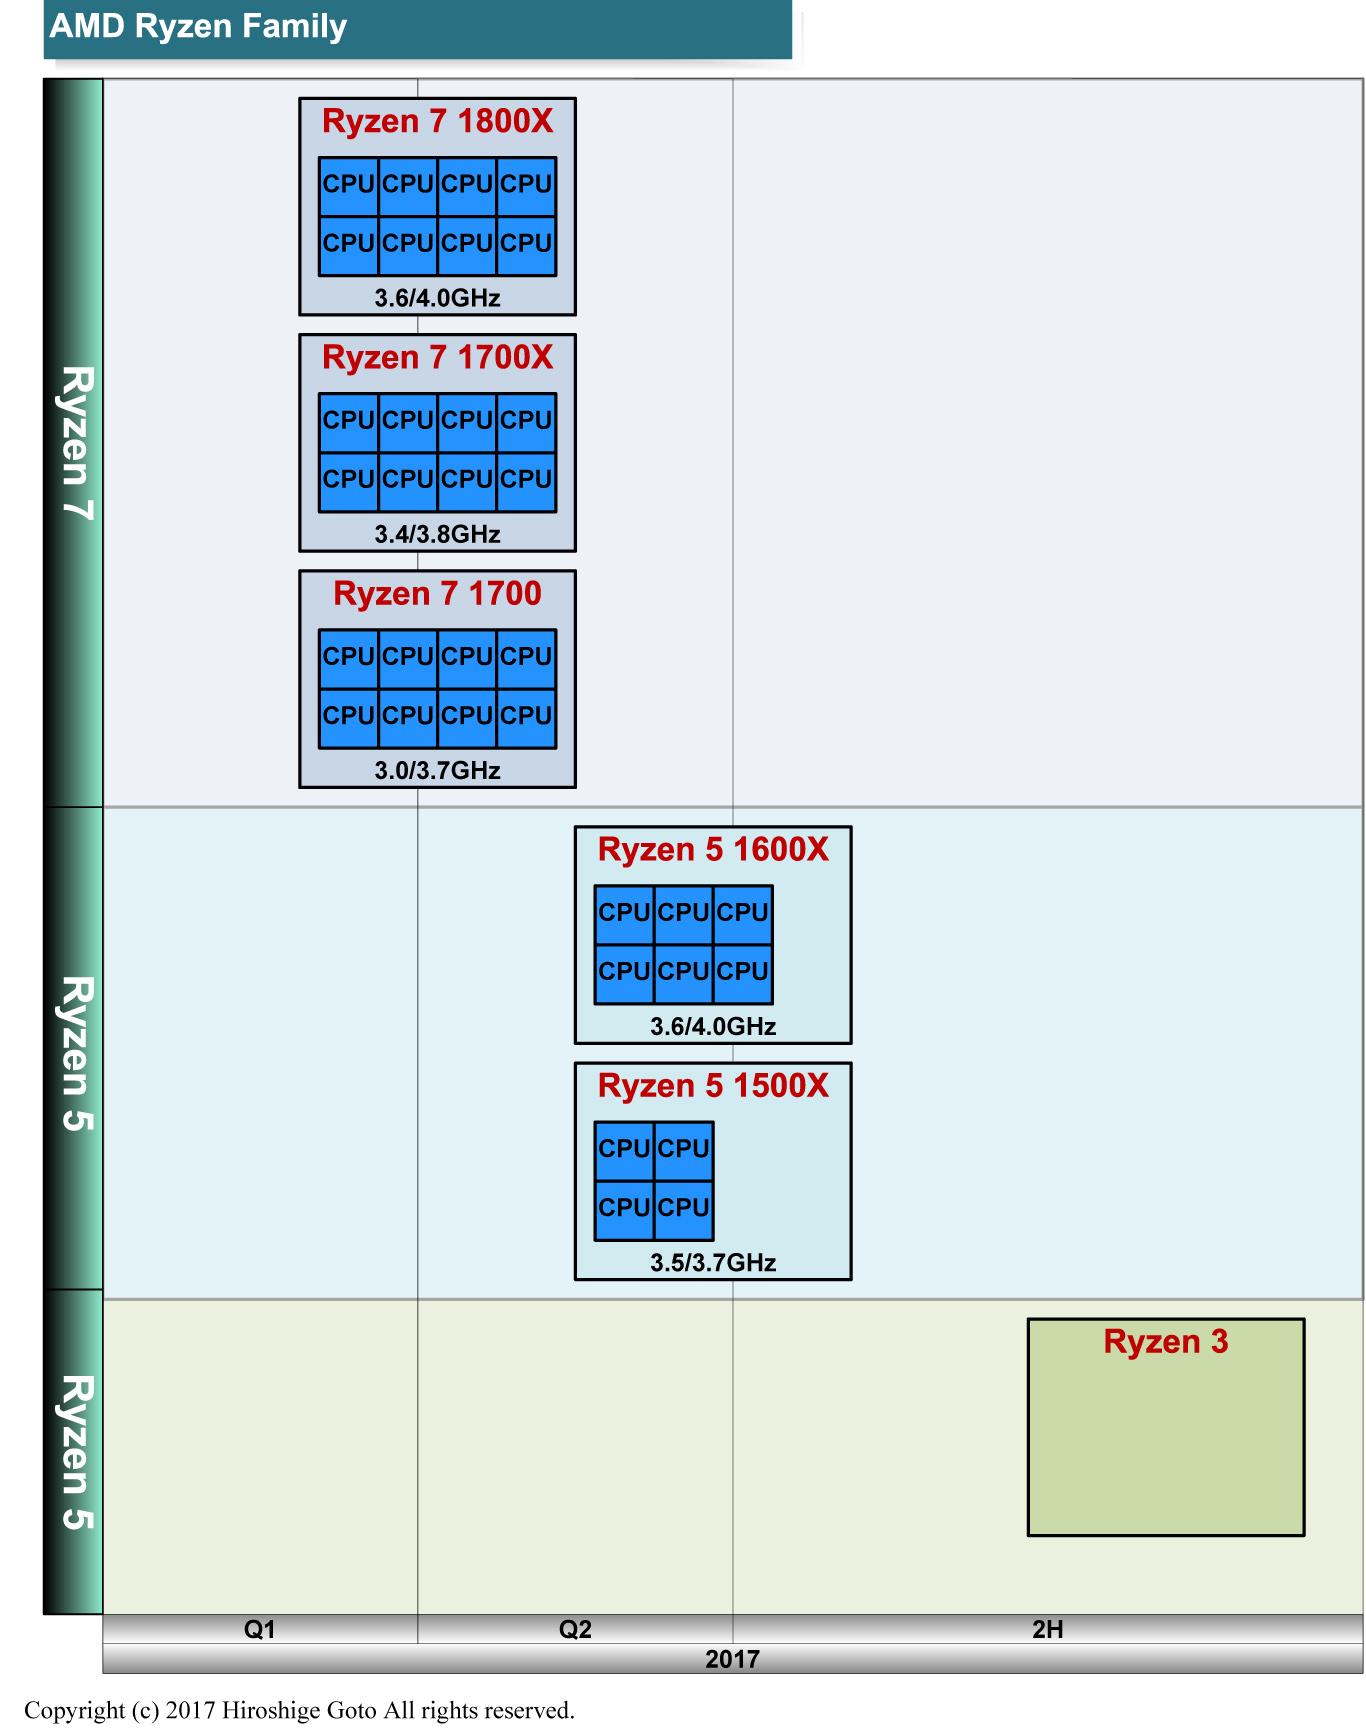 "Ryzen系製品のプラン<BR>PDF版は<span class=""img-inline raw""><a href="""" ipw_status=""1"" ipw_linktype=""filelink_raw"" class=""resource"">こちら</a></span>"